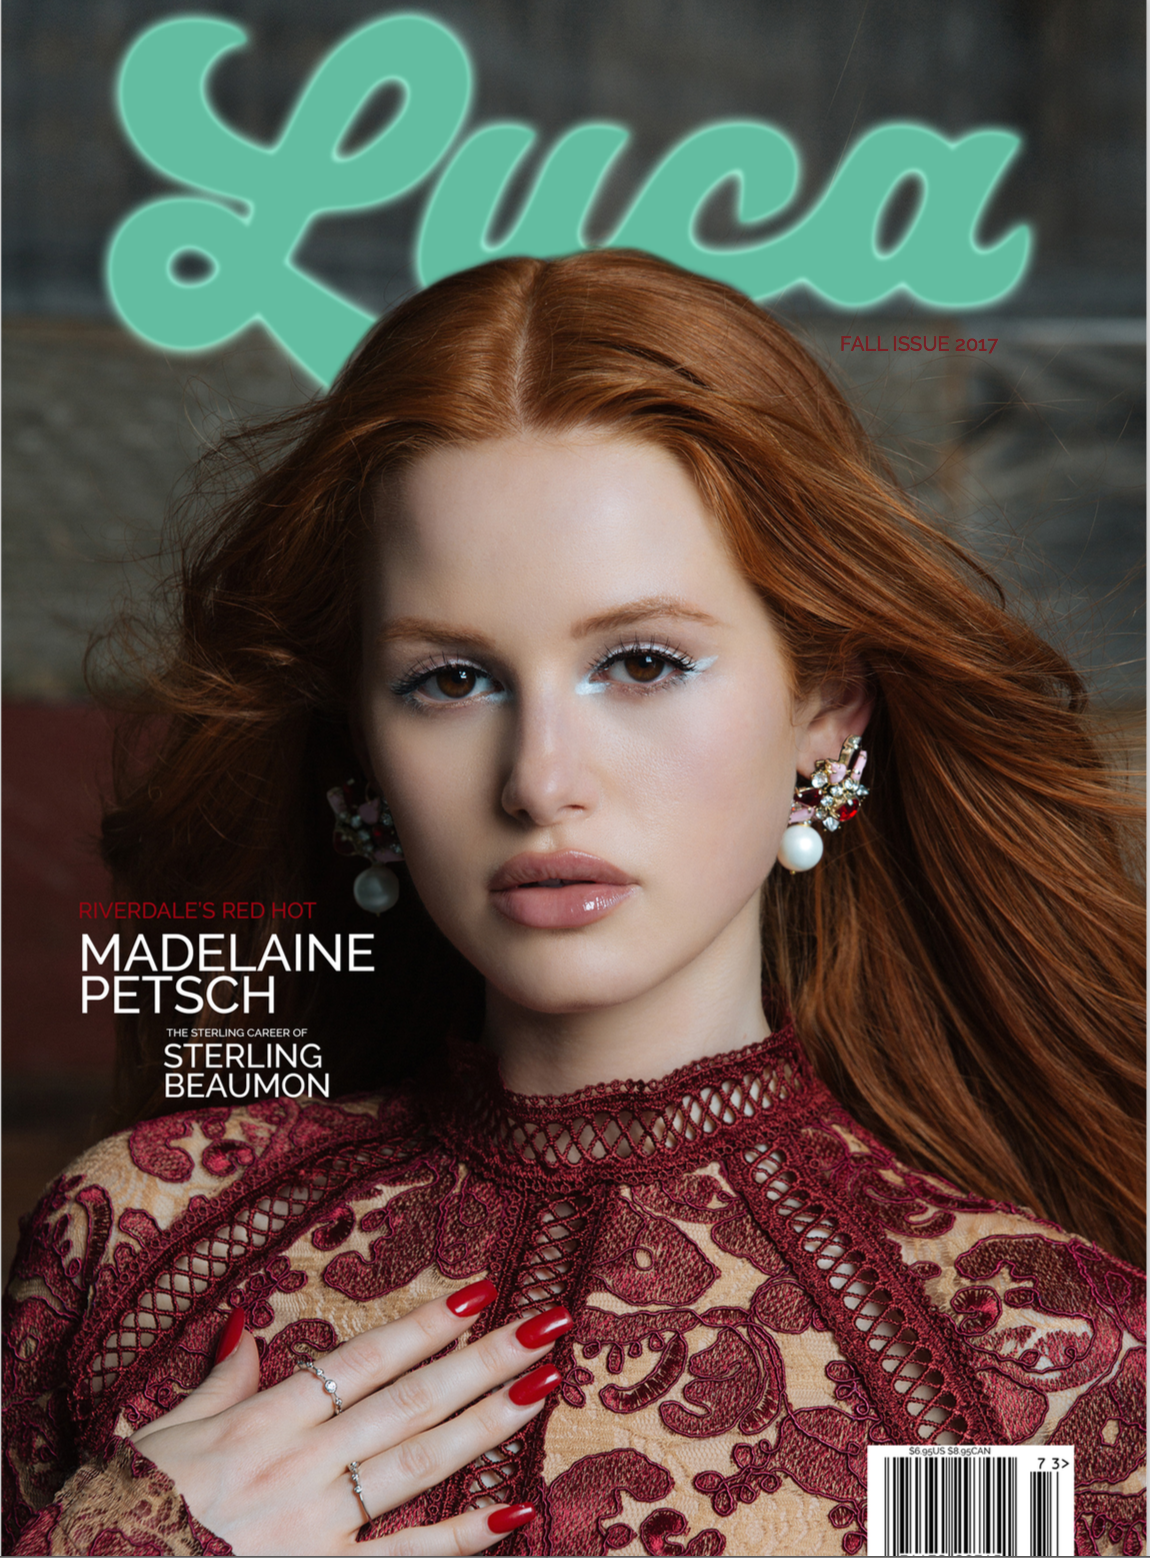 madelaine petsch luca magazine